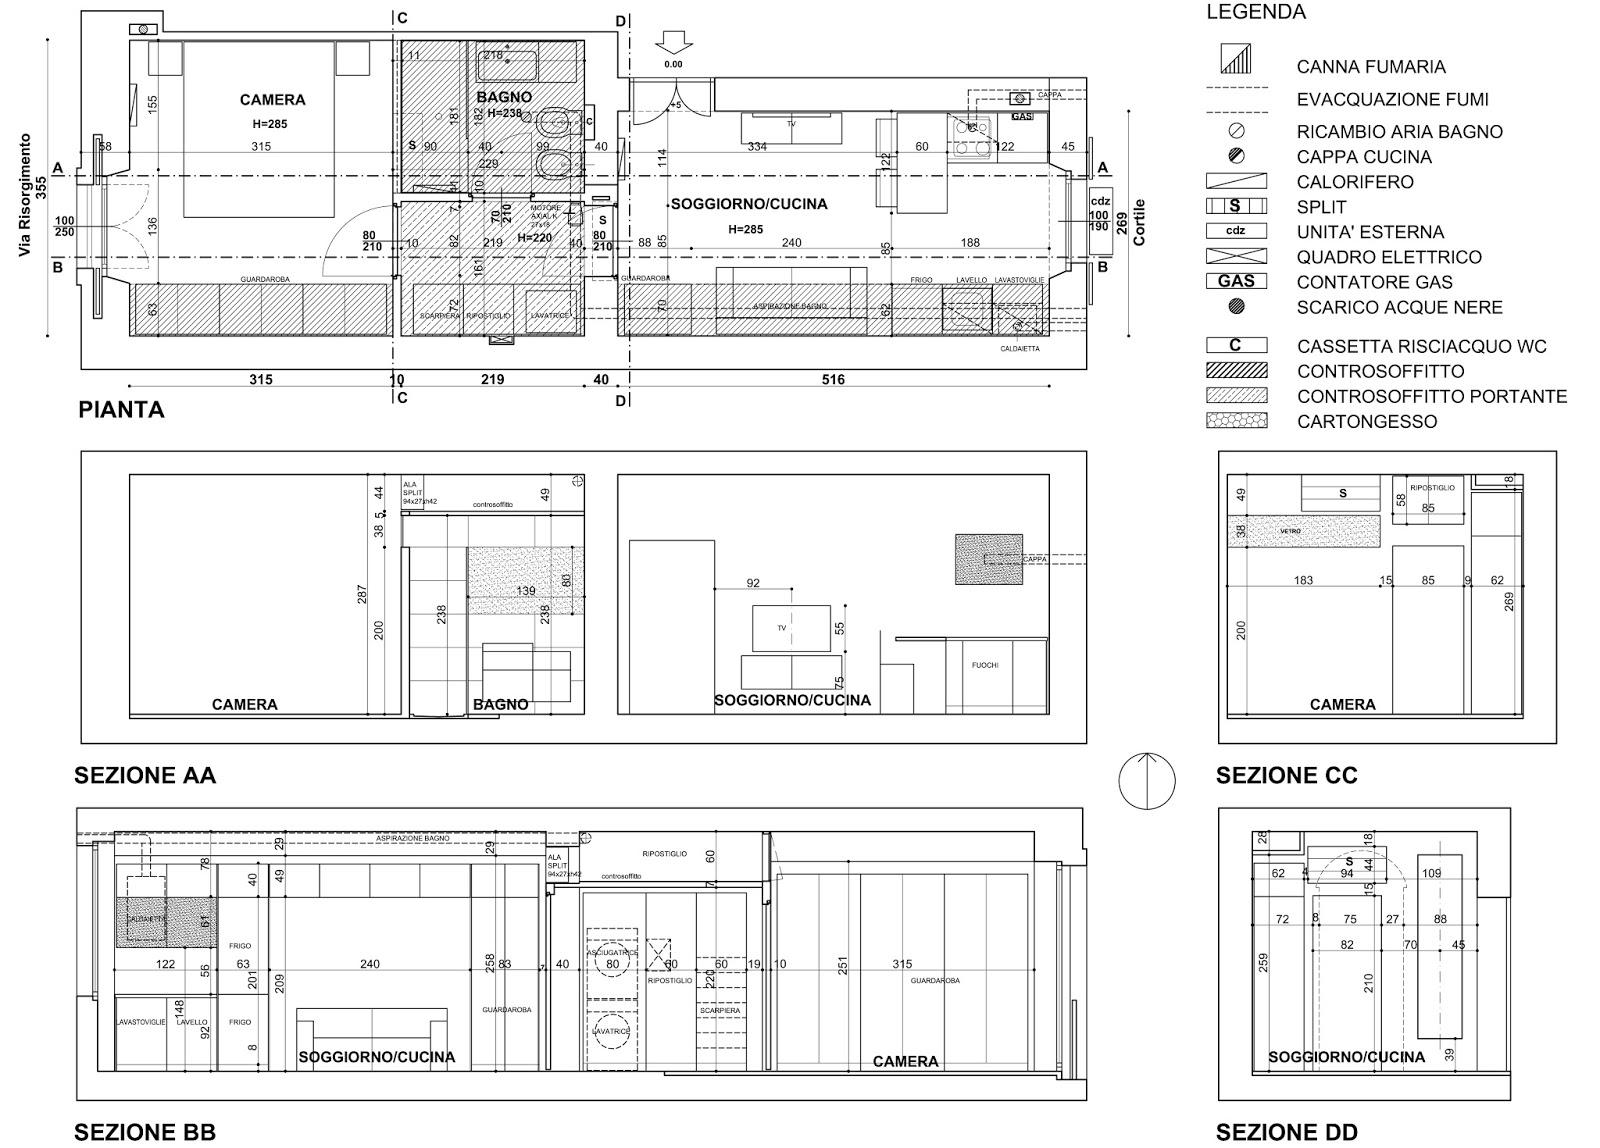 Ikea armadio profondita 35 cm cabina armadio ikea with ikea armadio profondita 35 cm fabulous - Armadi ikea misure ...